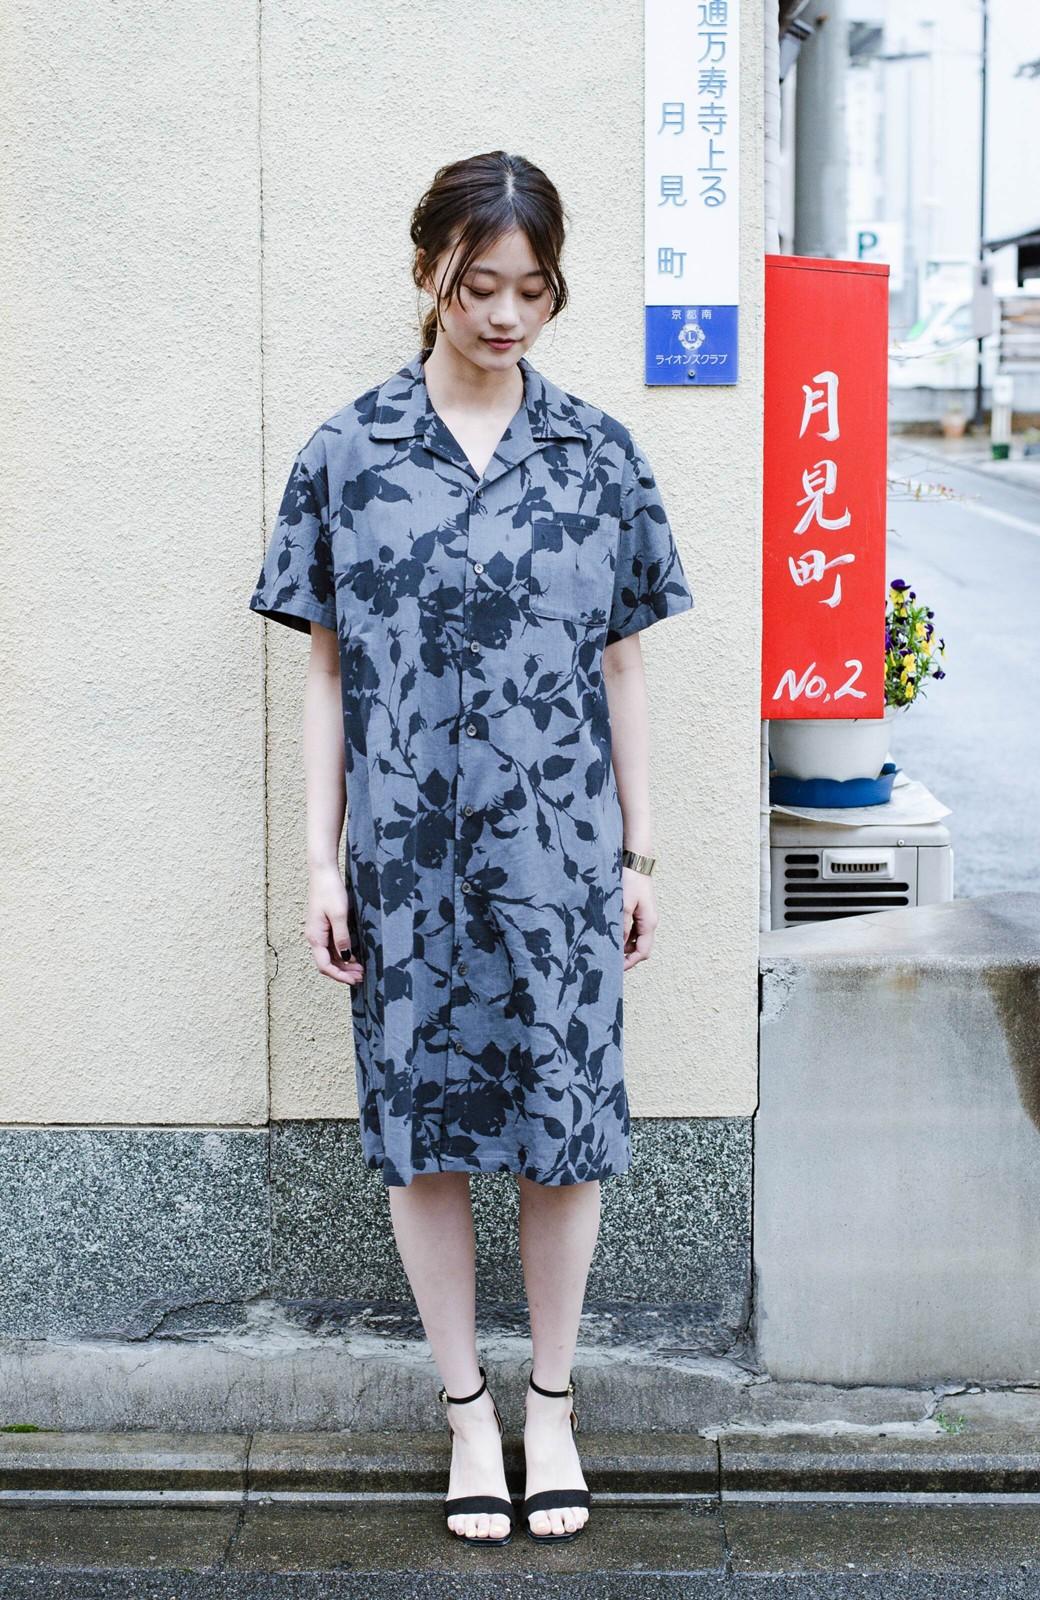 haco! 【コラボ3年目!】京都の浴衣屋さんと作った浴衣生地のシャツワンピース <グレー系その他>の商品写真2